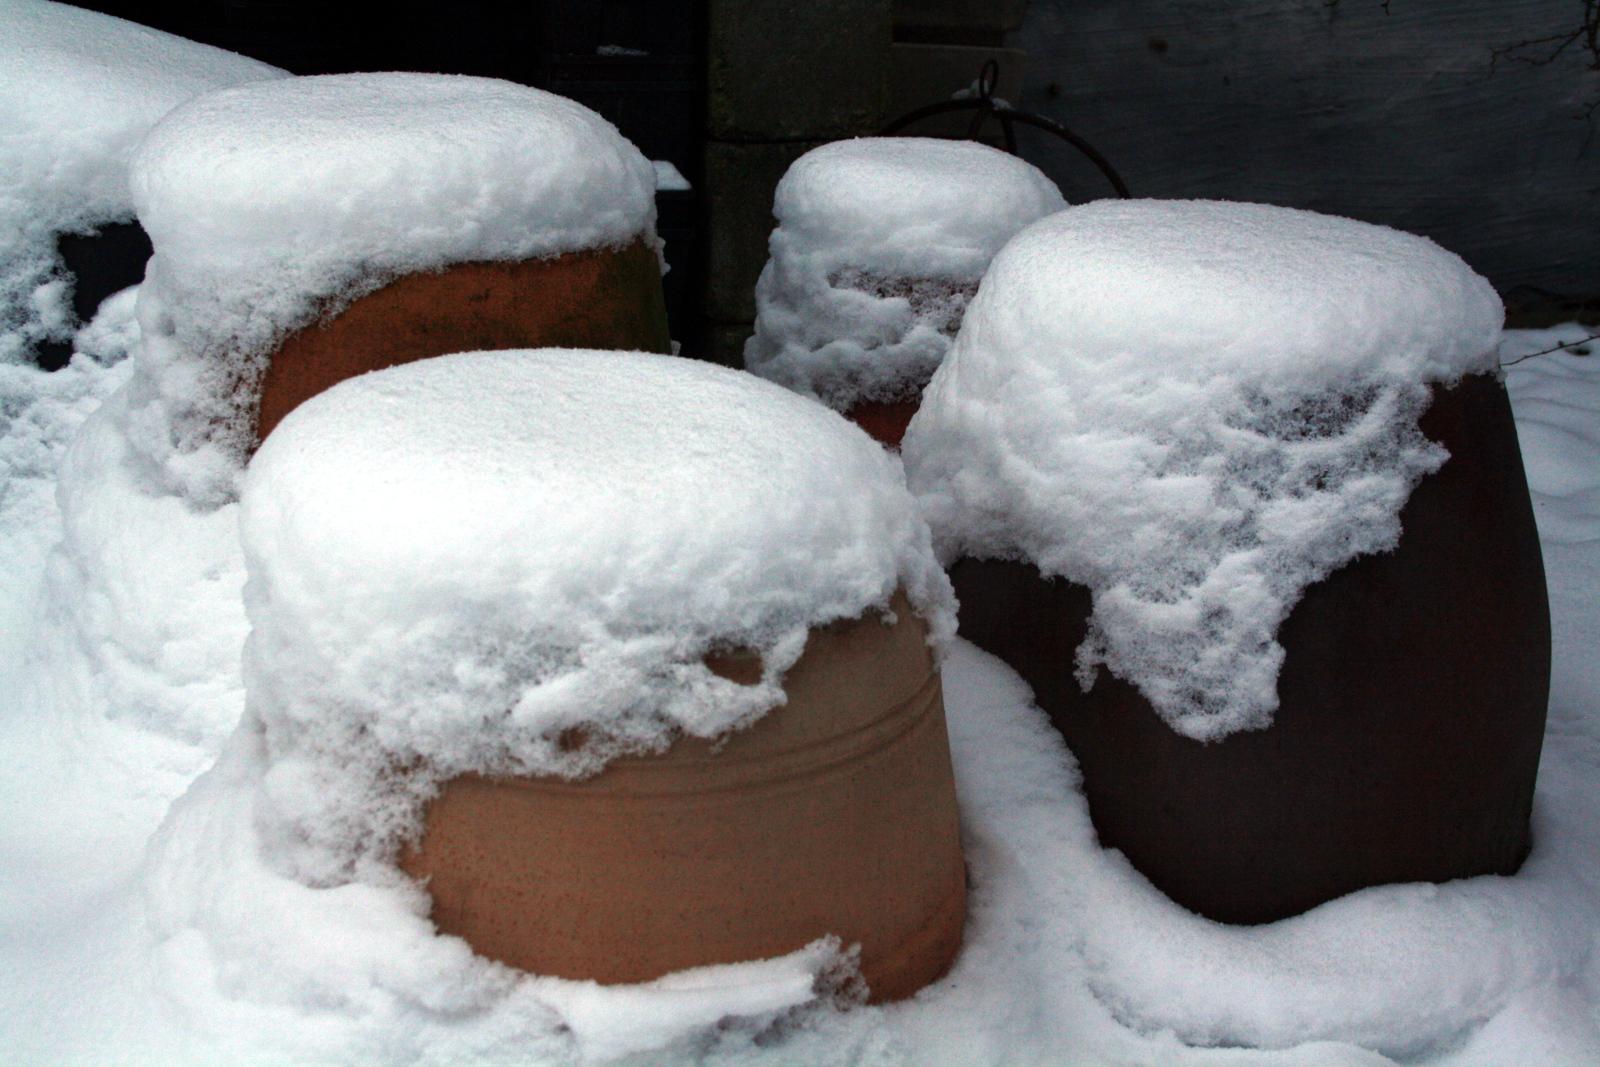 Urtepotter med sne